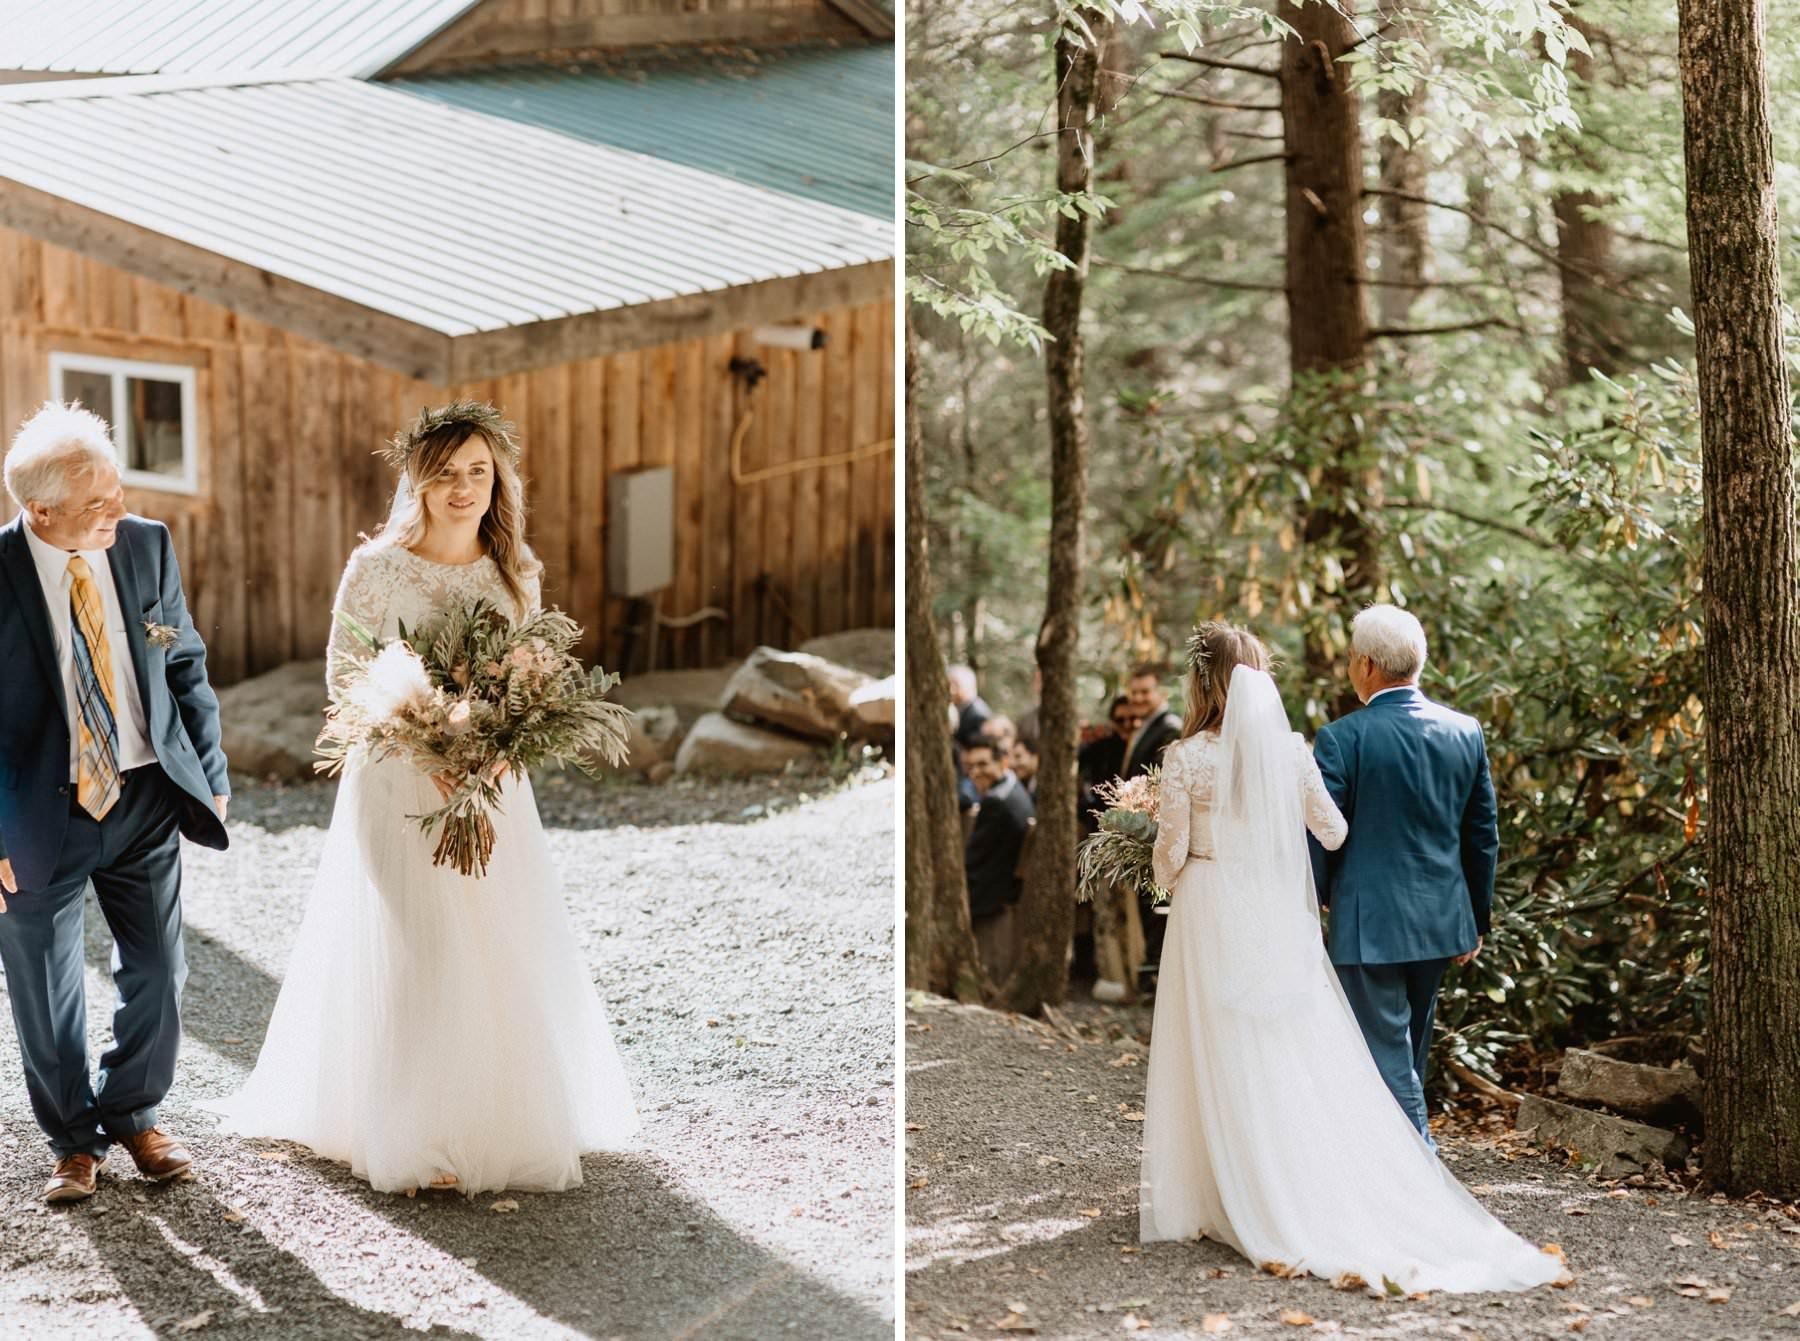 034-Tall-timber-barn-wedding-47.jpg